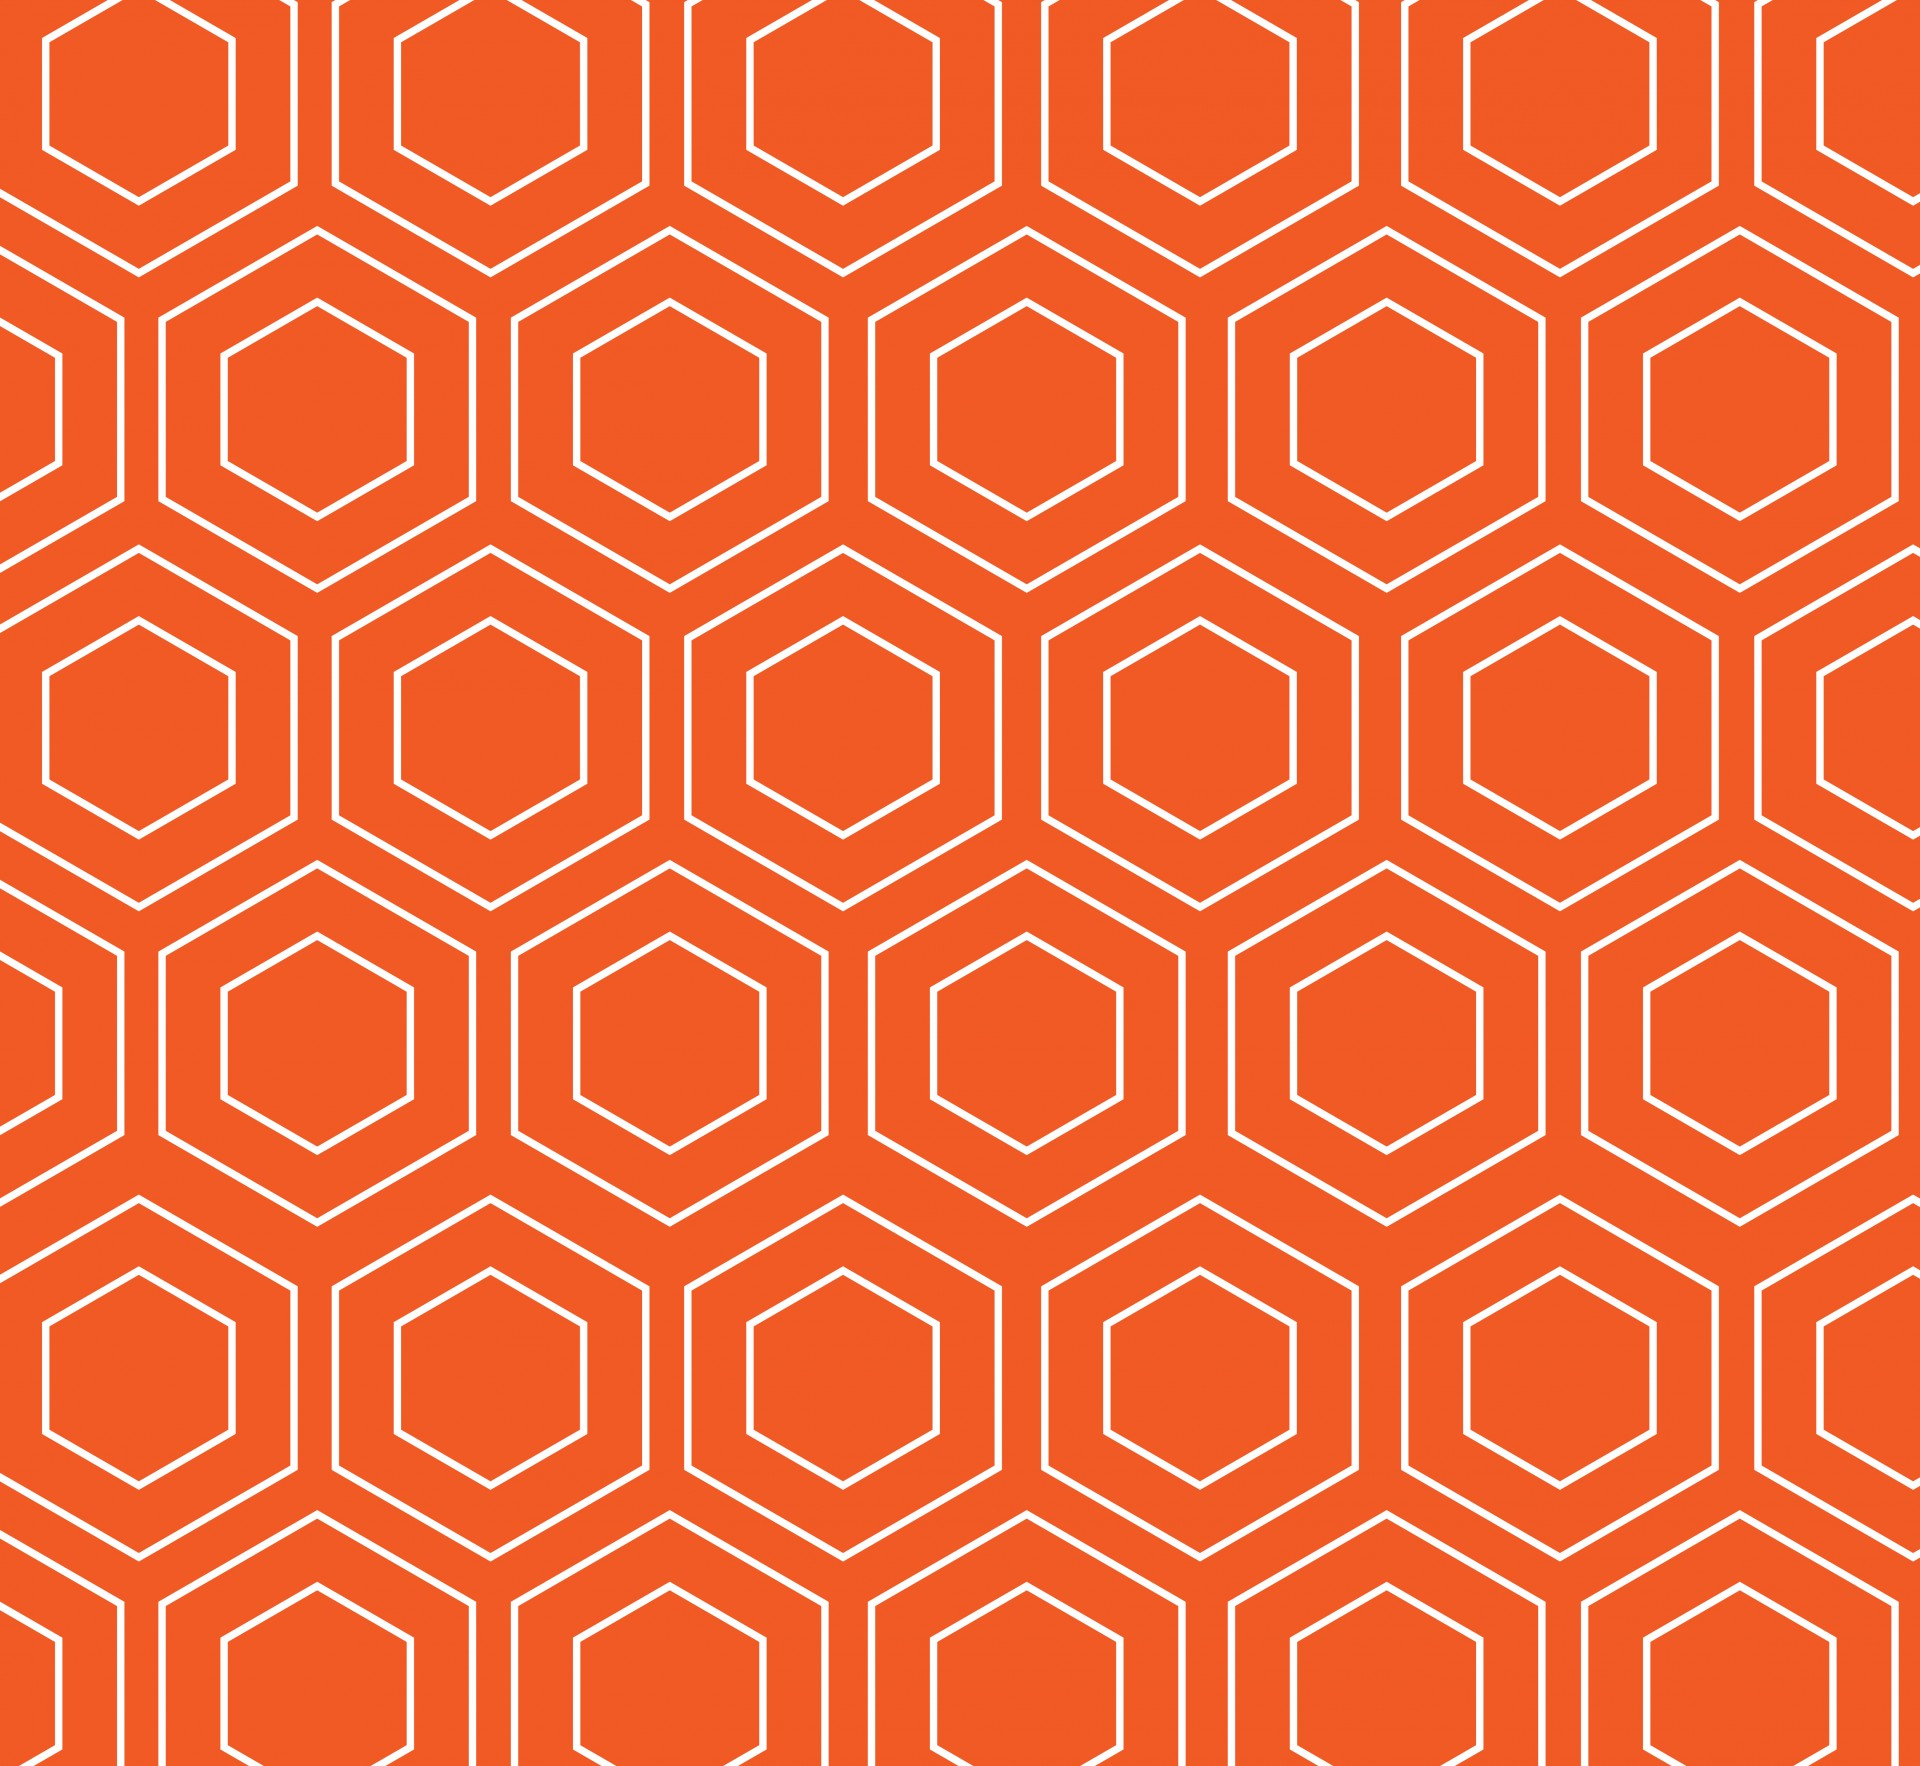 Geometric Wallpaper Pattern Orange Stock Photo   Public Domain 1920x1766